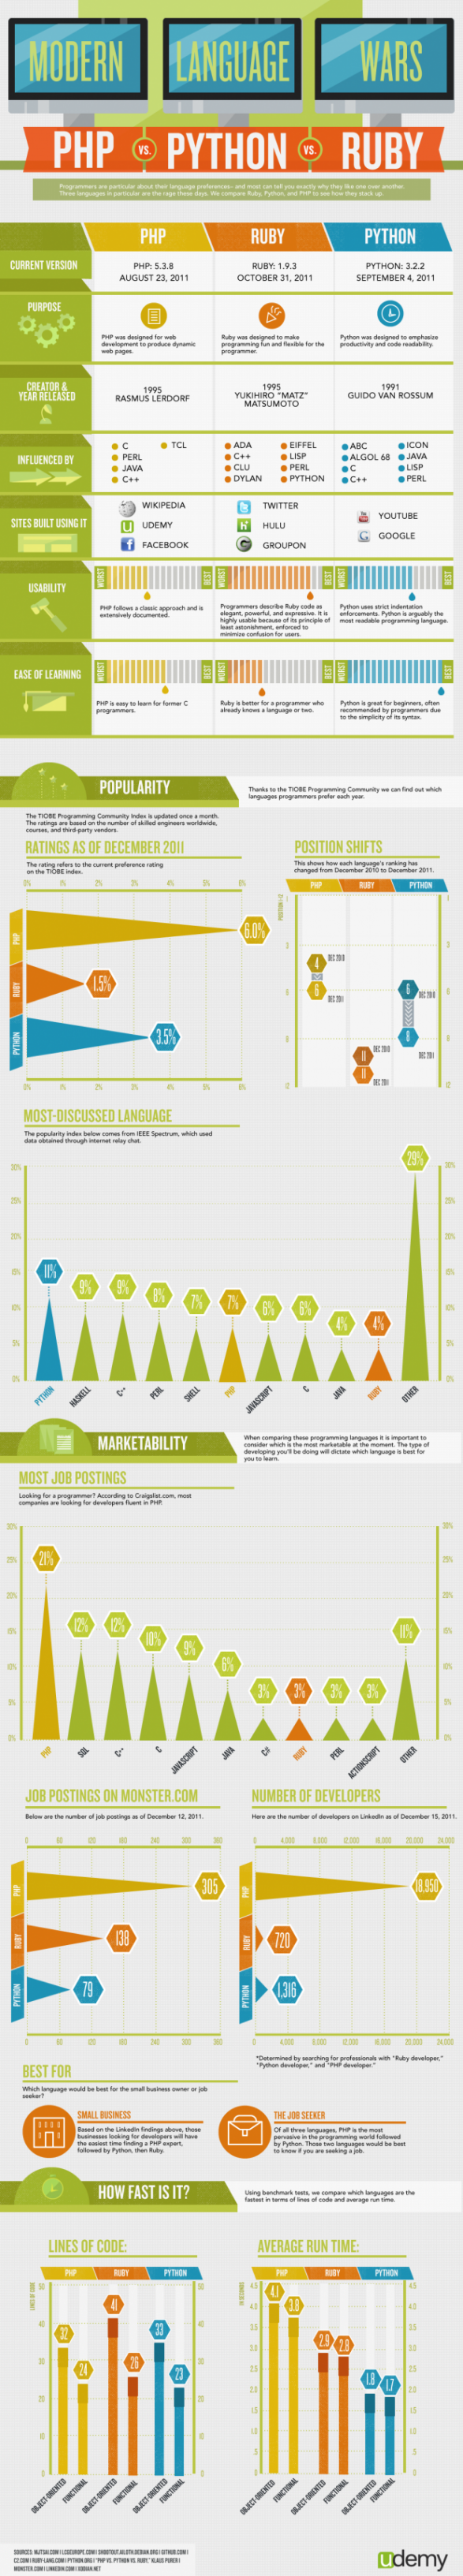 Modern language wars #infographic PHP vs Python vs Ruby